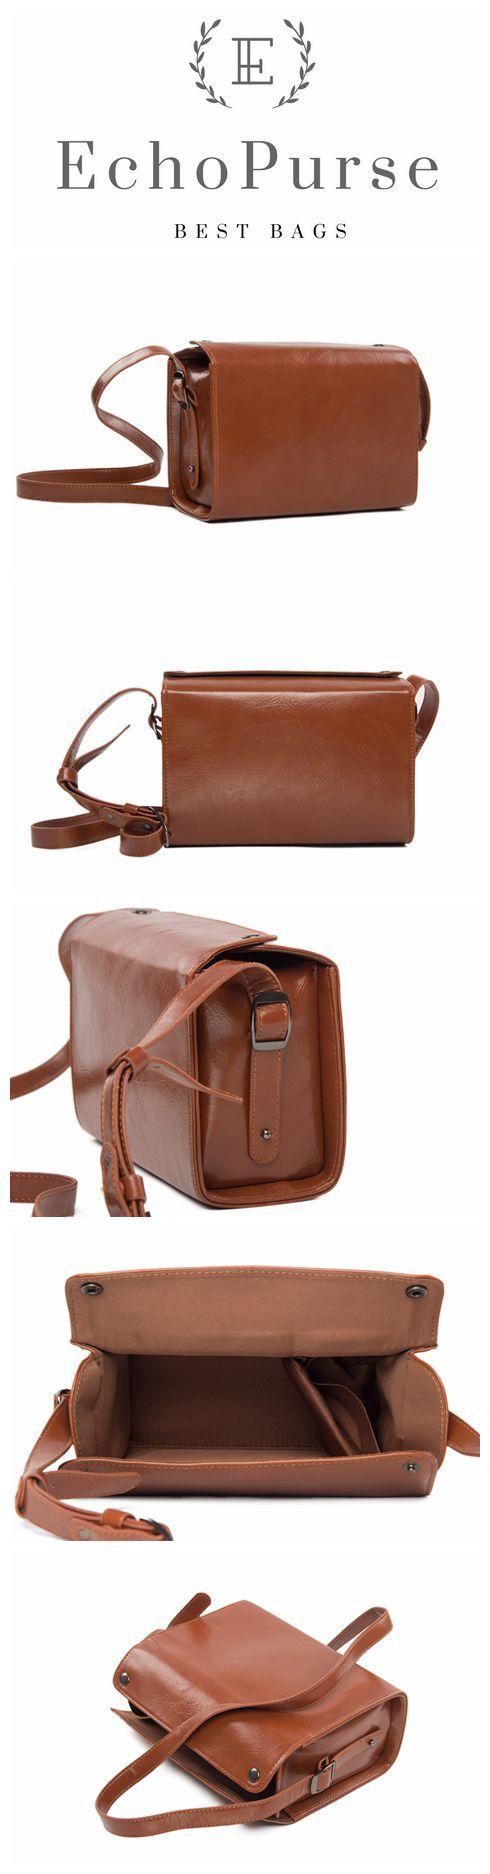 Handmade PU Leather Mirrorless DSLR Camera Bag, Brown SLR Camera Case 189